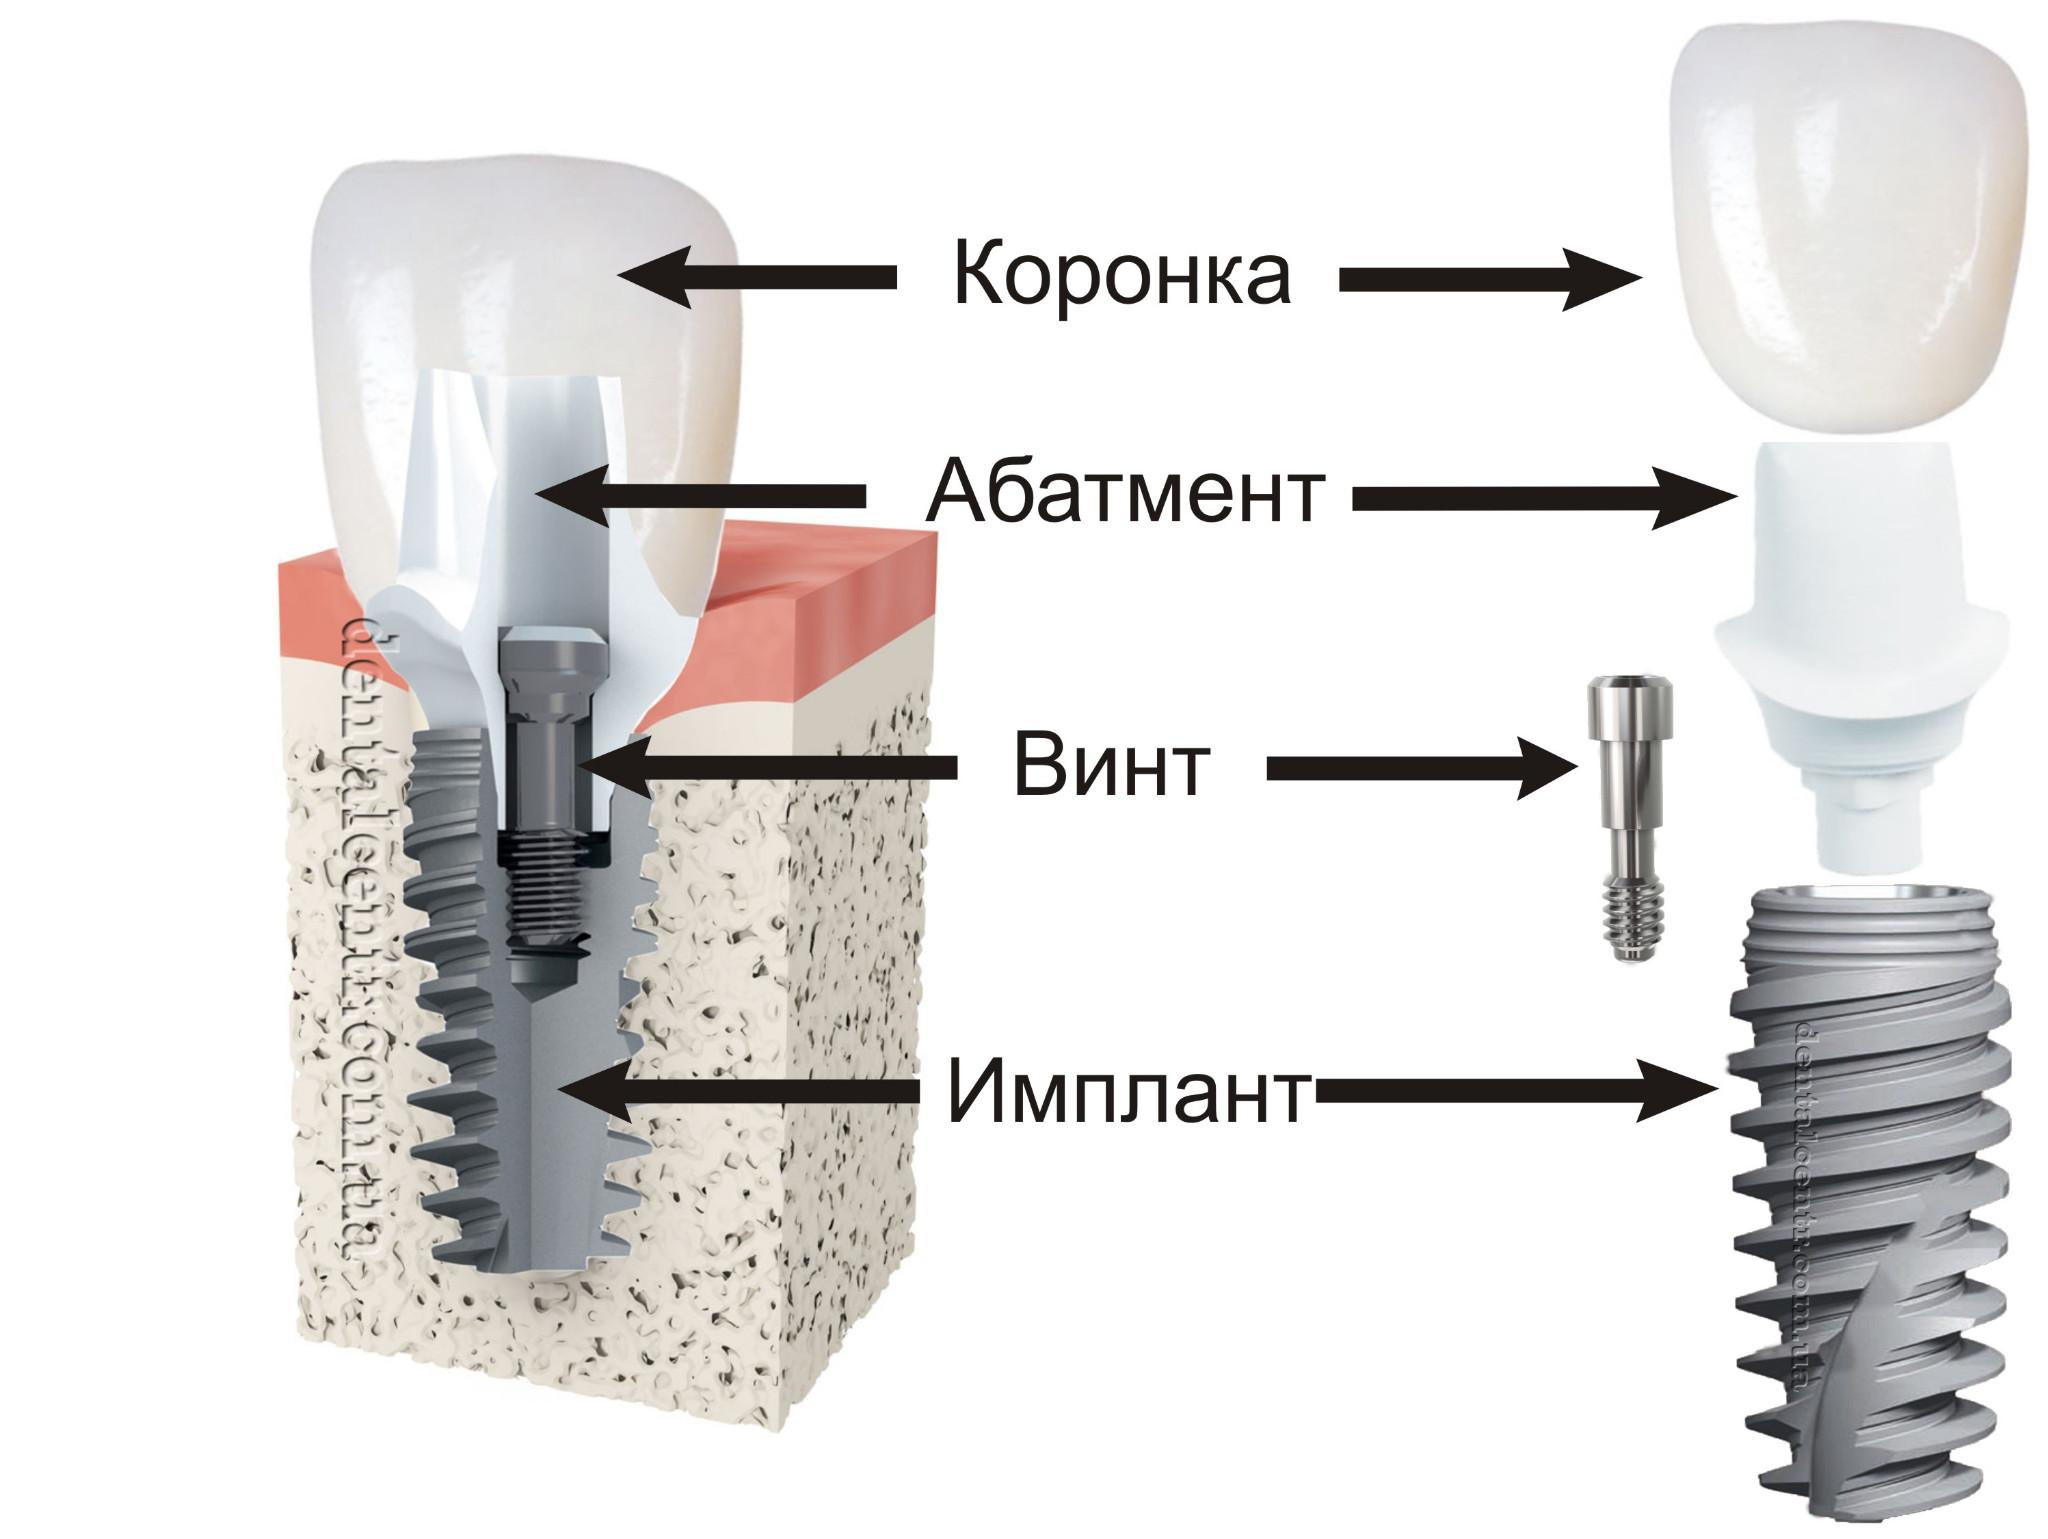 Коронка абатмент